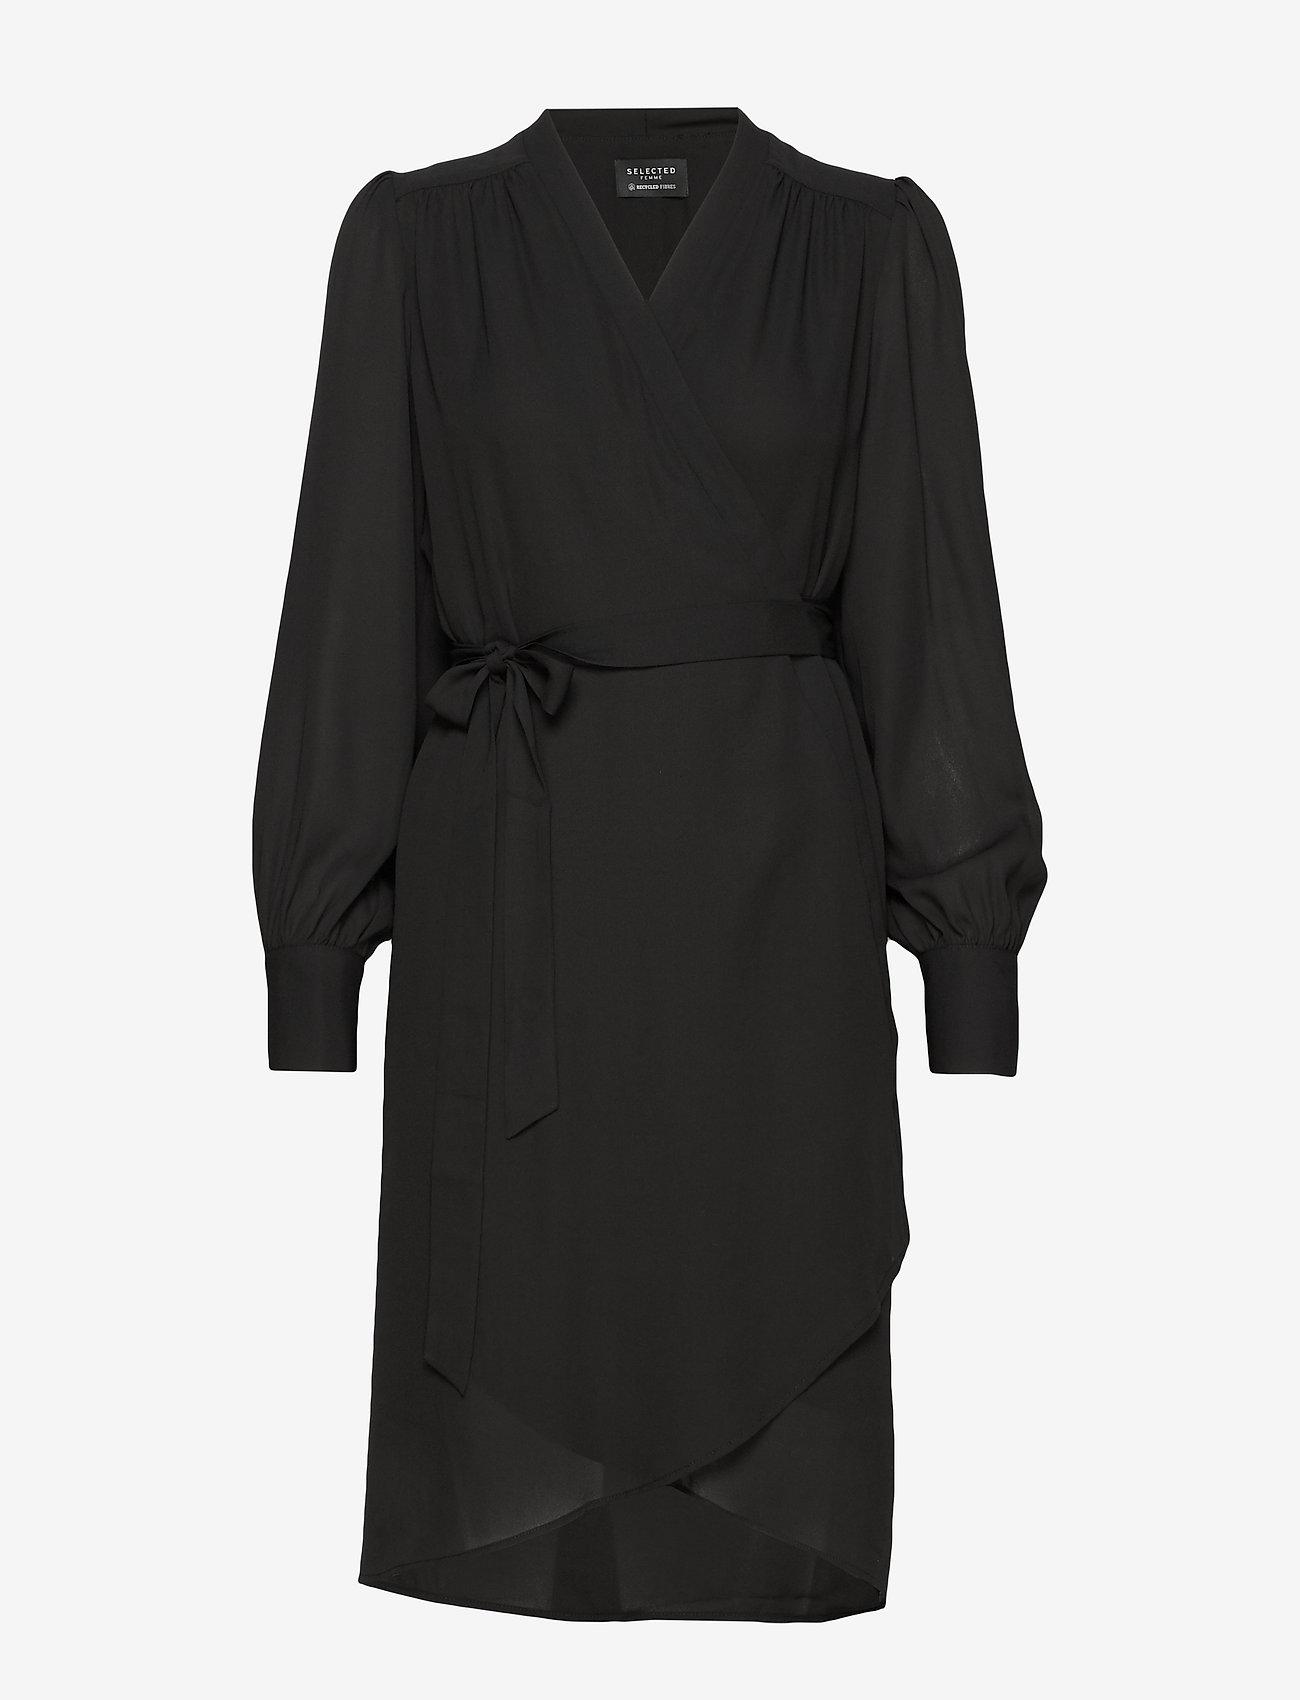 Selected Femme - SLFALVA LS WRAP DRESS NOOS - robes portefeuille - black - 0